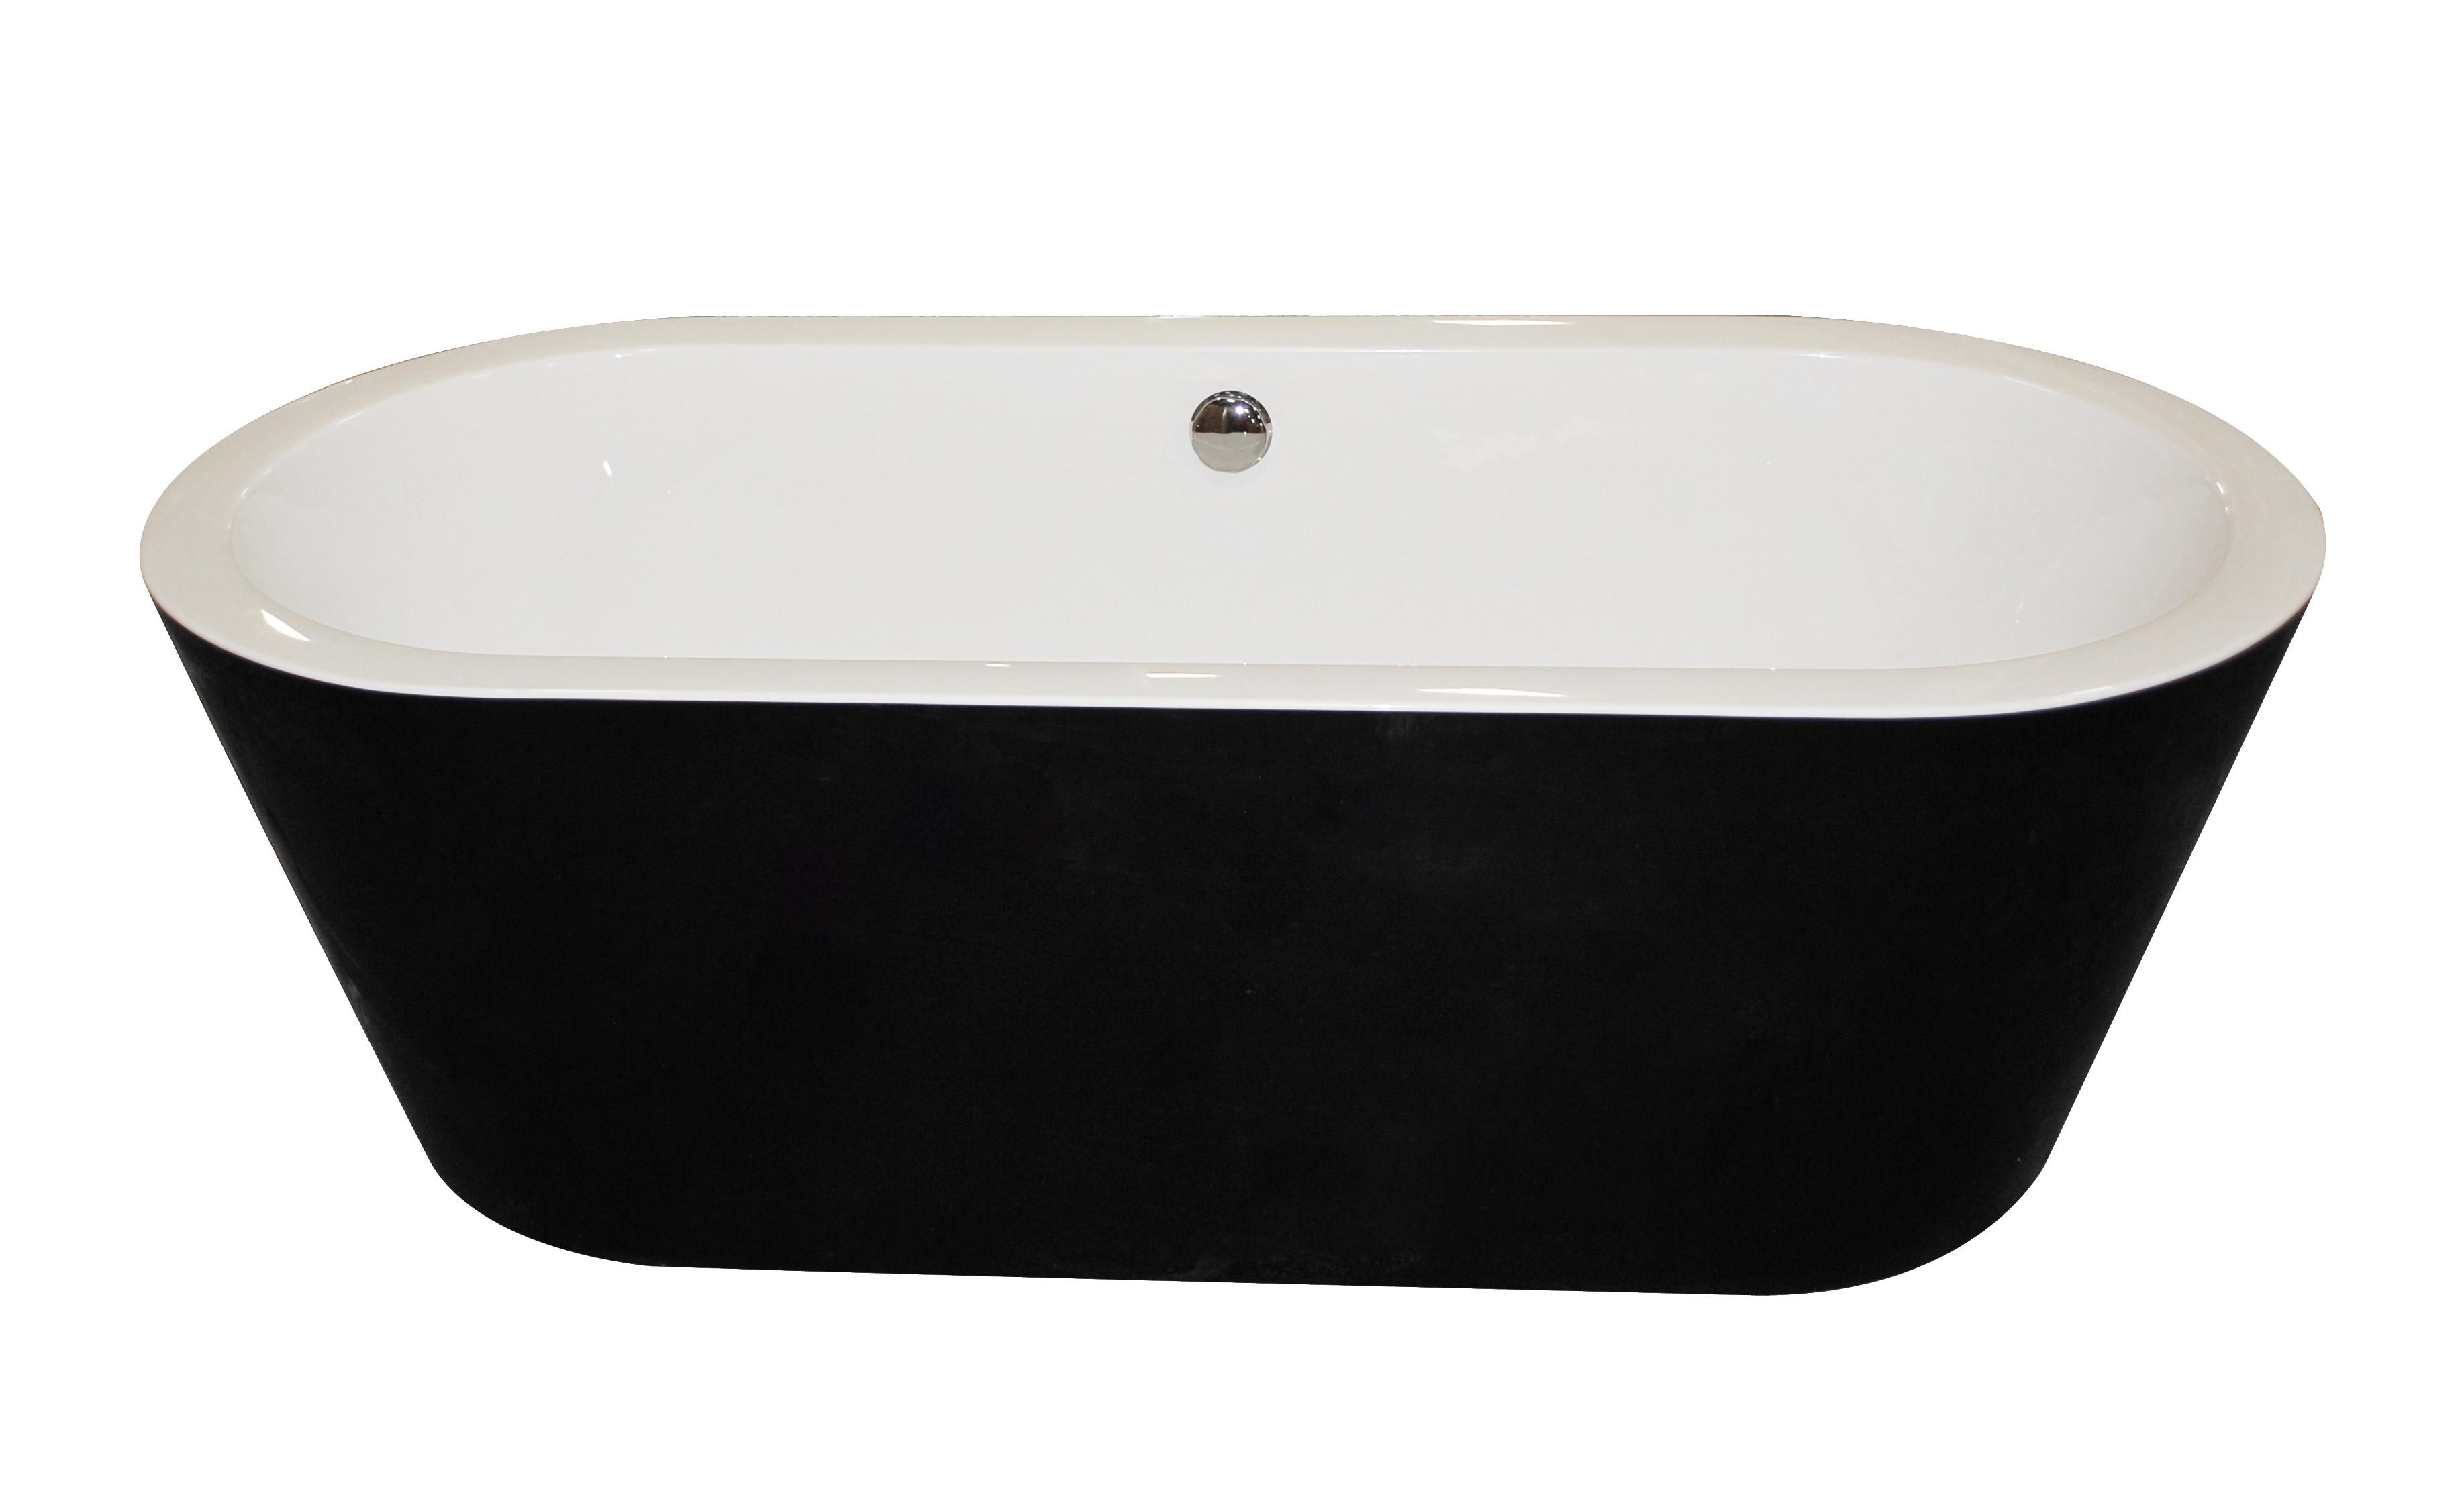 Anzzi FT-AZ013 Dualita Center Drain Freestanding Bathtub in Glossy Black